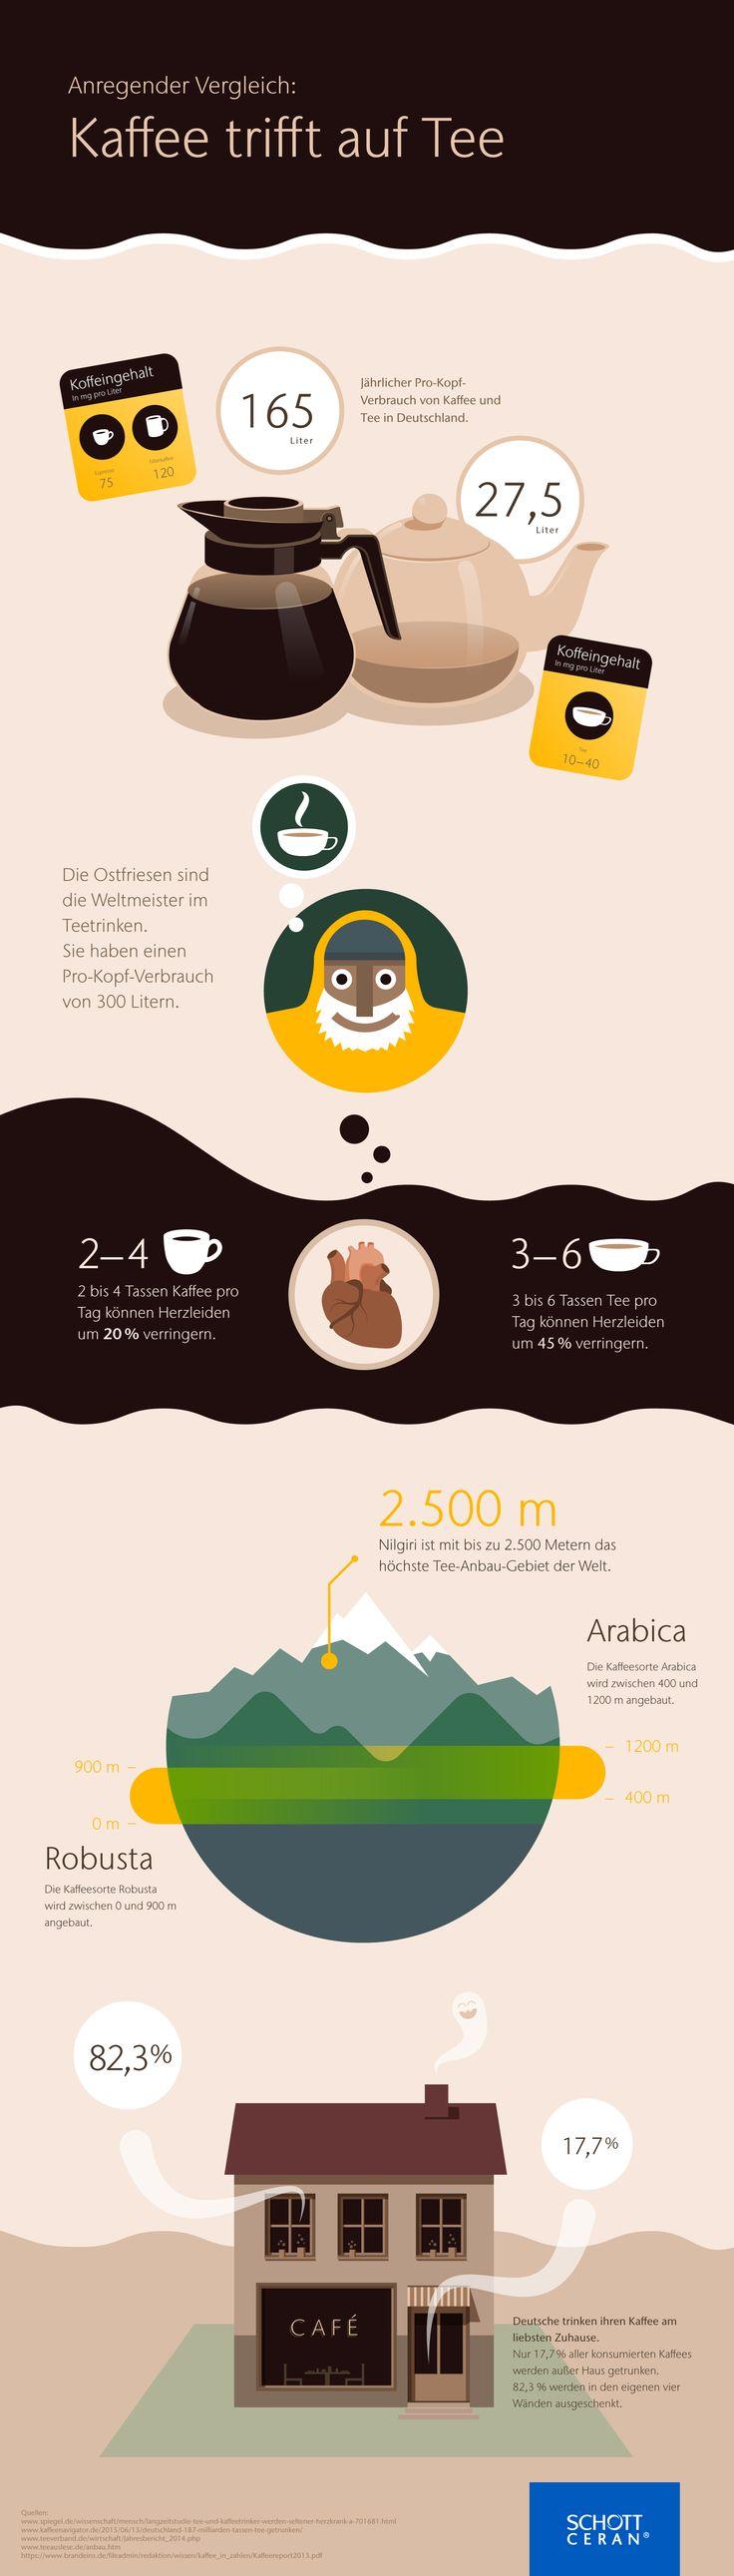 """Zwei Wachmacher im Vergleich"" #kaffee #tee #coffee #tea #espresso #latte #americano #cappucino #gunpowder #greentea #chunmee #sencha #genmaicha #lemon #jasmin #mint #blacktea #infografik #infographic"